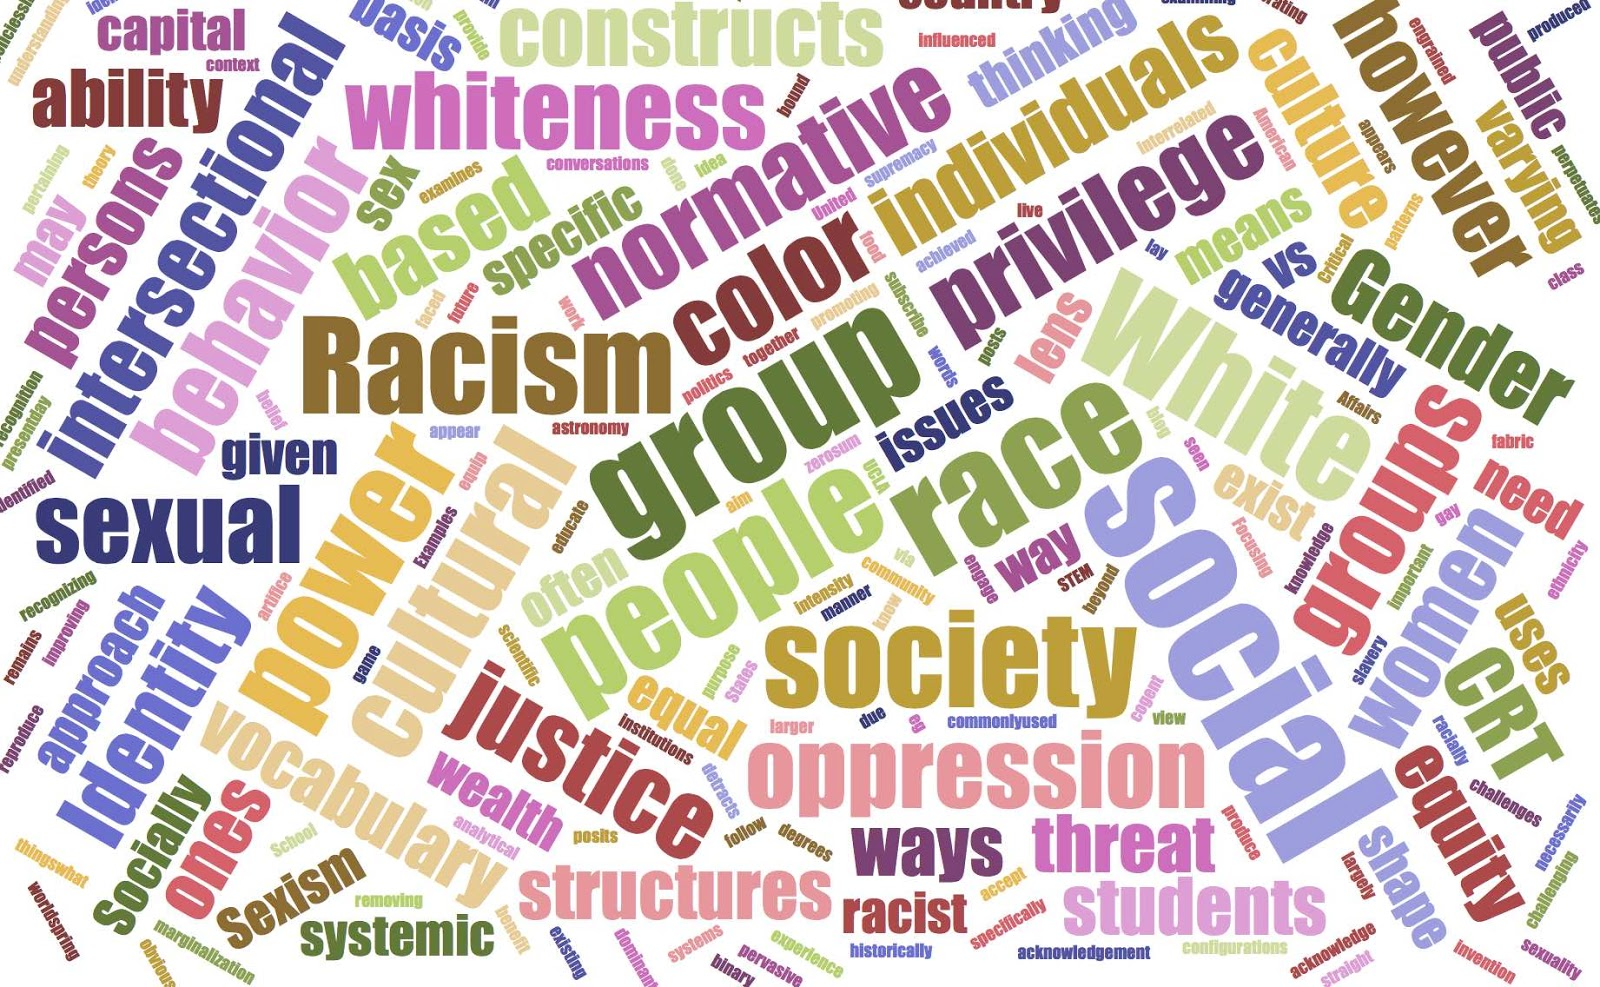 Power oppression and society sociology essay